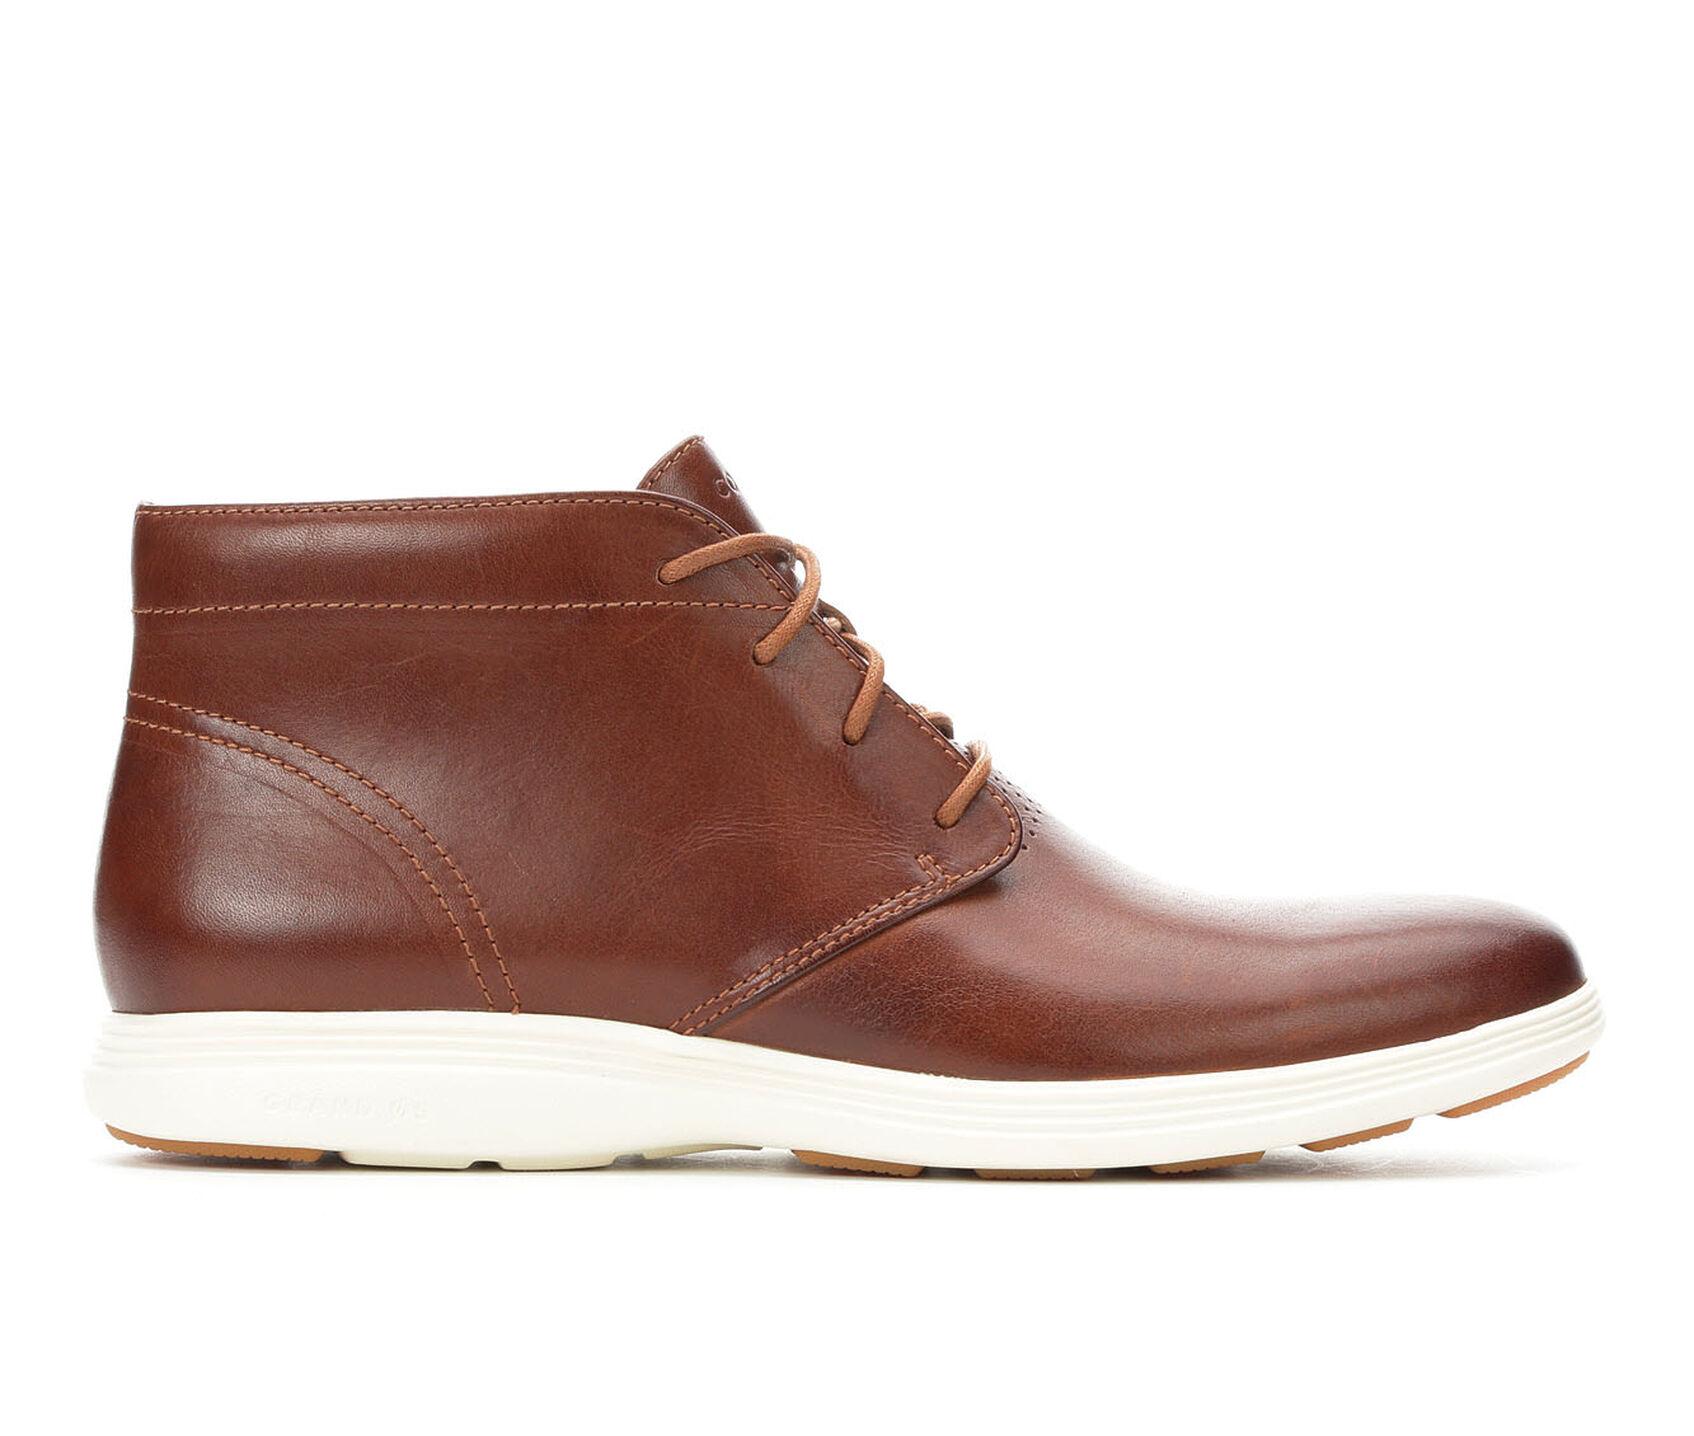 15f23388f9c4d5 ... Cole Haan Grand Tour Chukka Dress Shoes. Previous